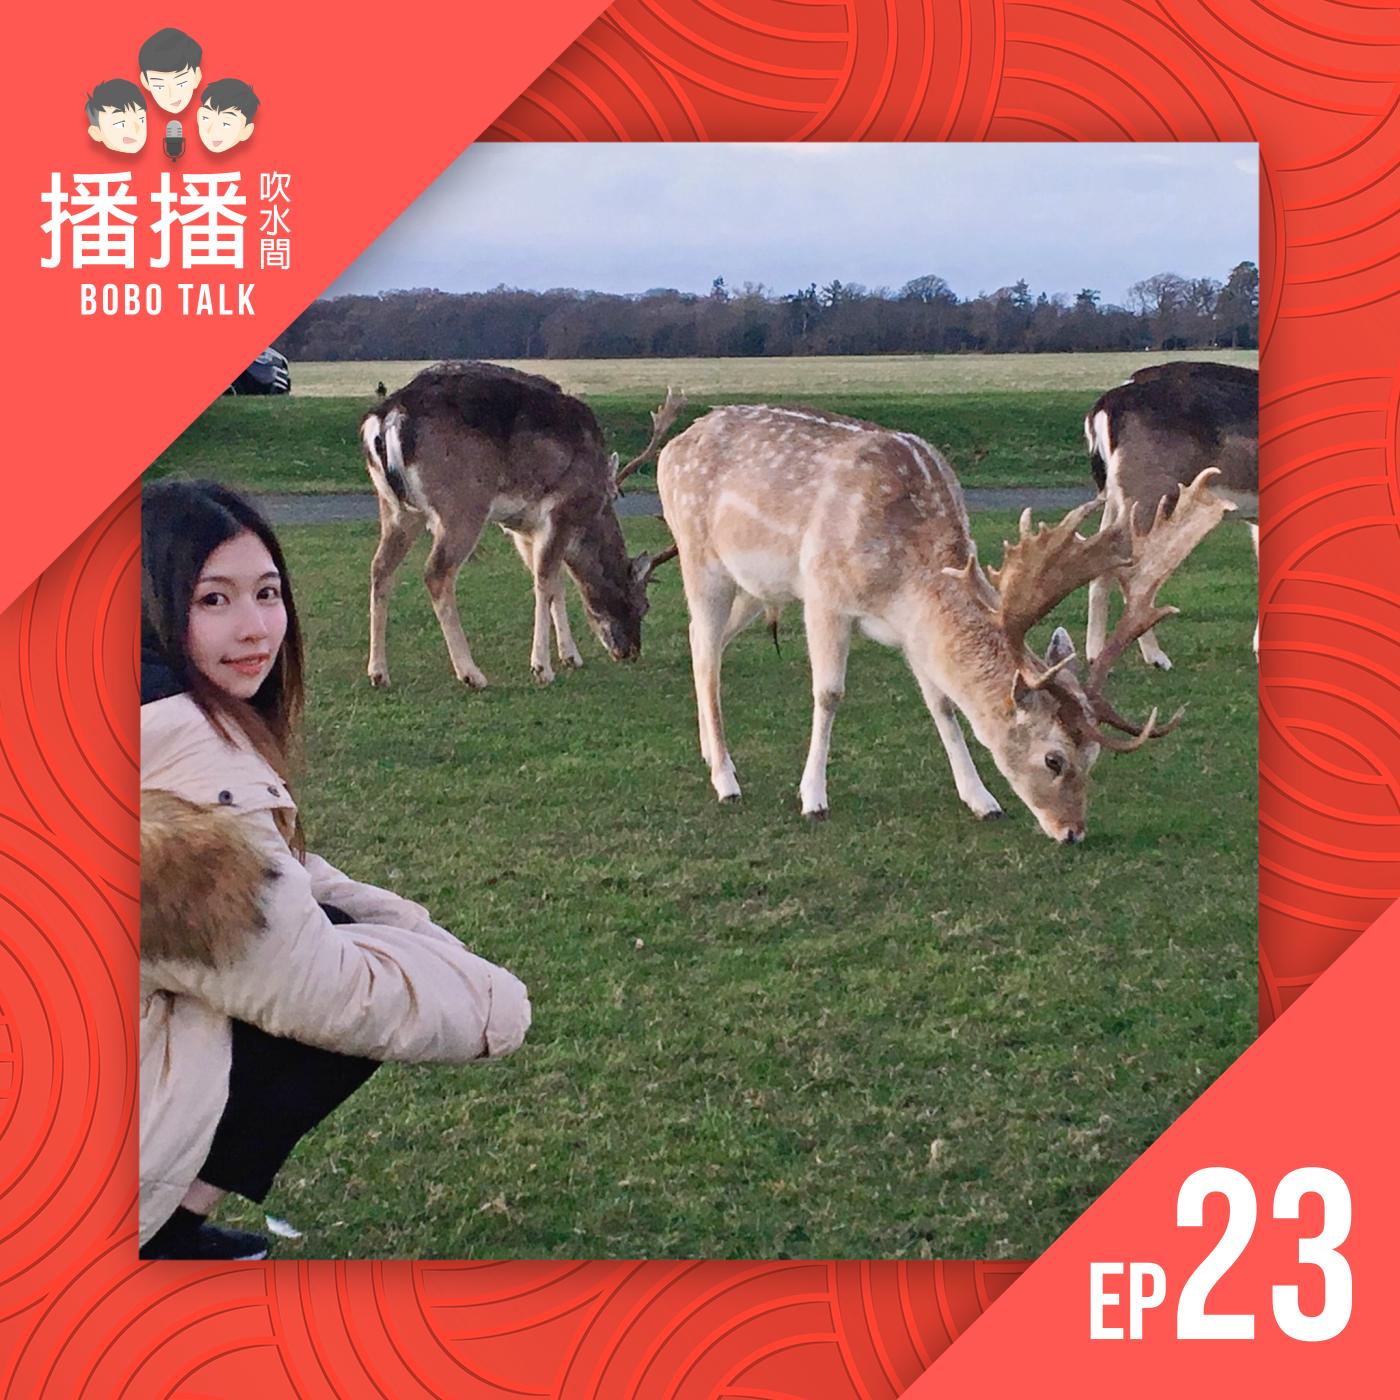 EP23 - 《Jio你來吹水 ft. 荒唐小姐歐北共》台灣人對大馬的刻板印象!